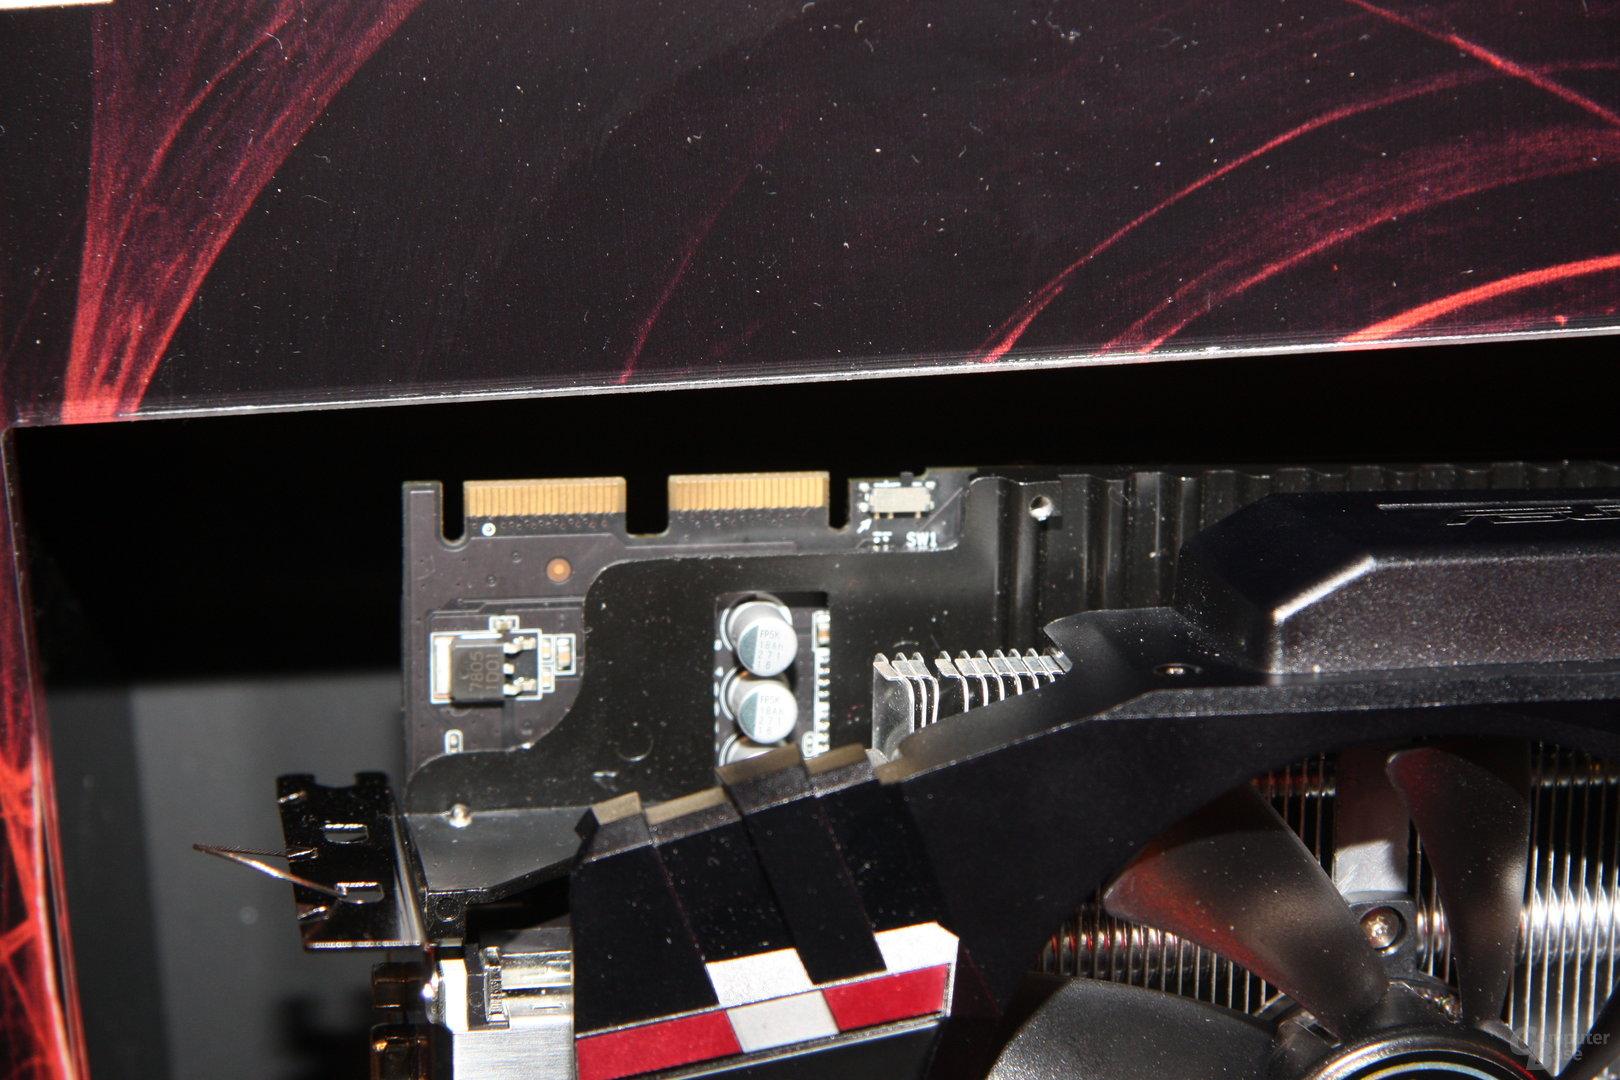 Asus ROG Matrix Radeon HD 7970